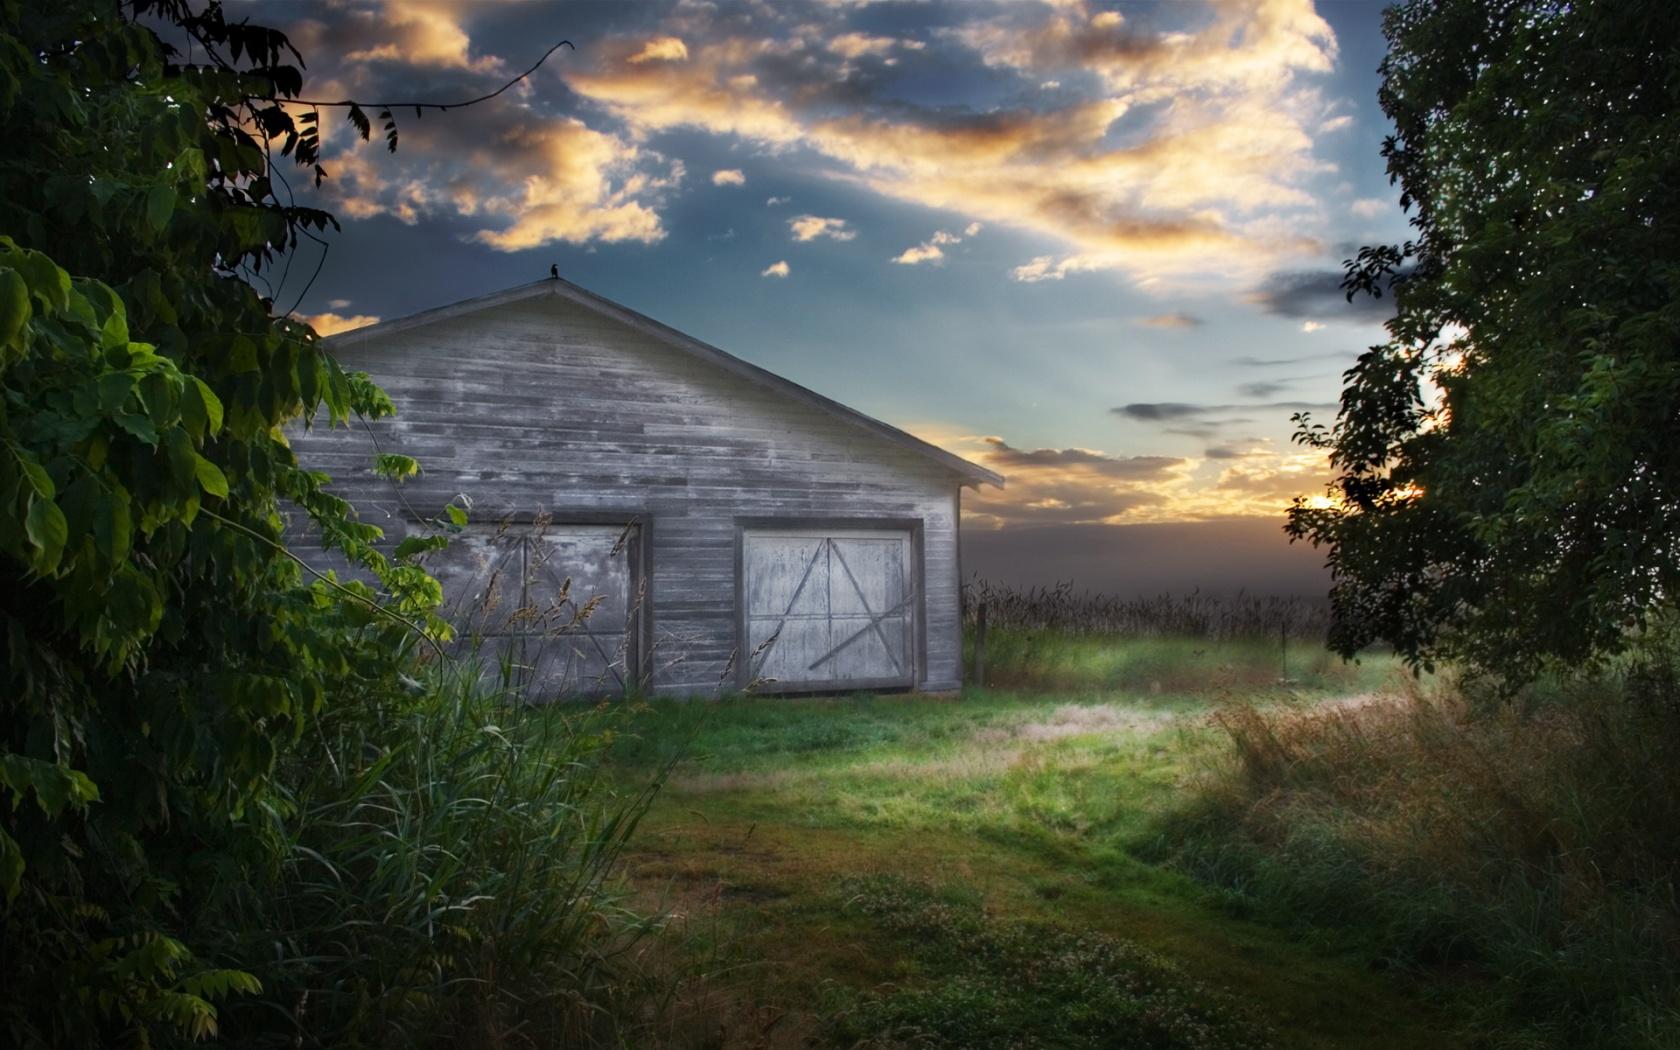 Kansas Dream Home Wallpapers HD Wallpapers 1680x1050